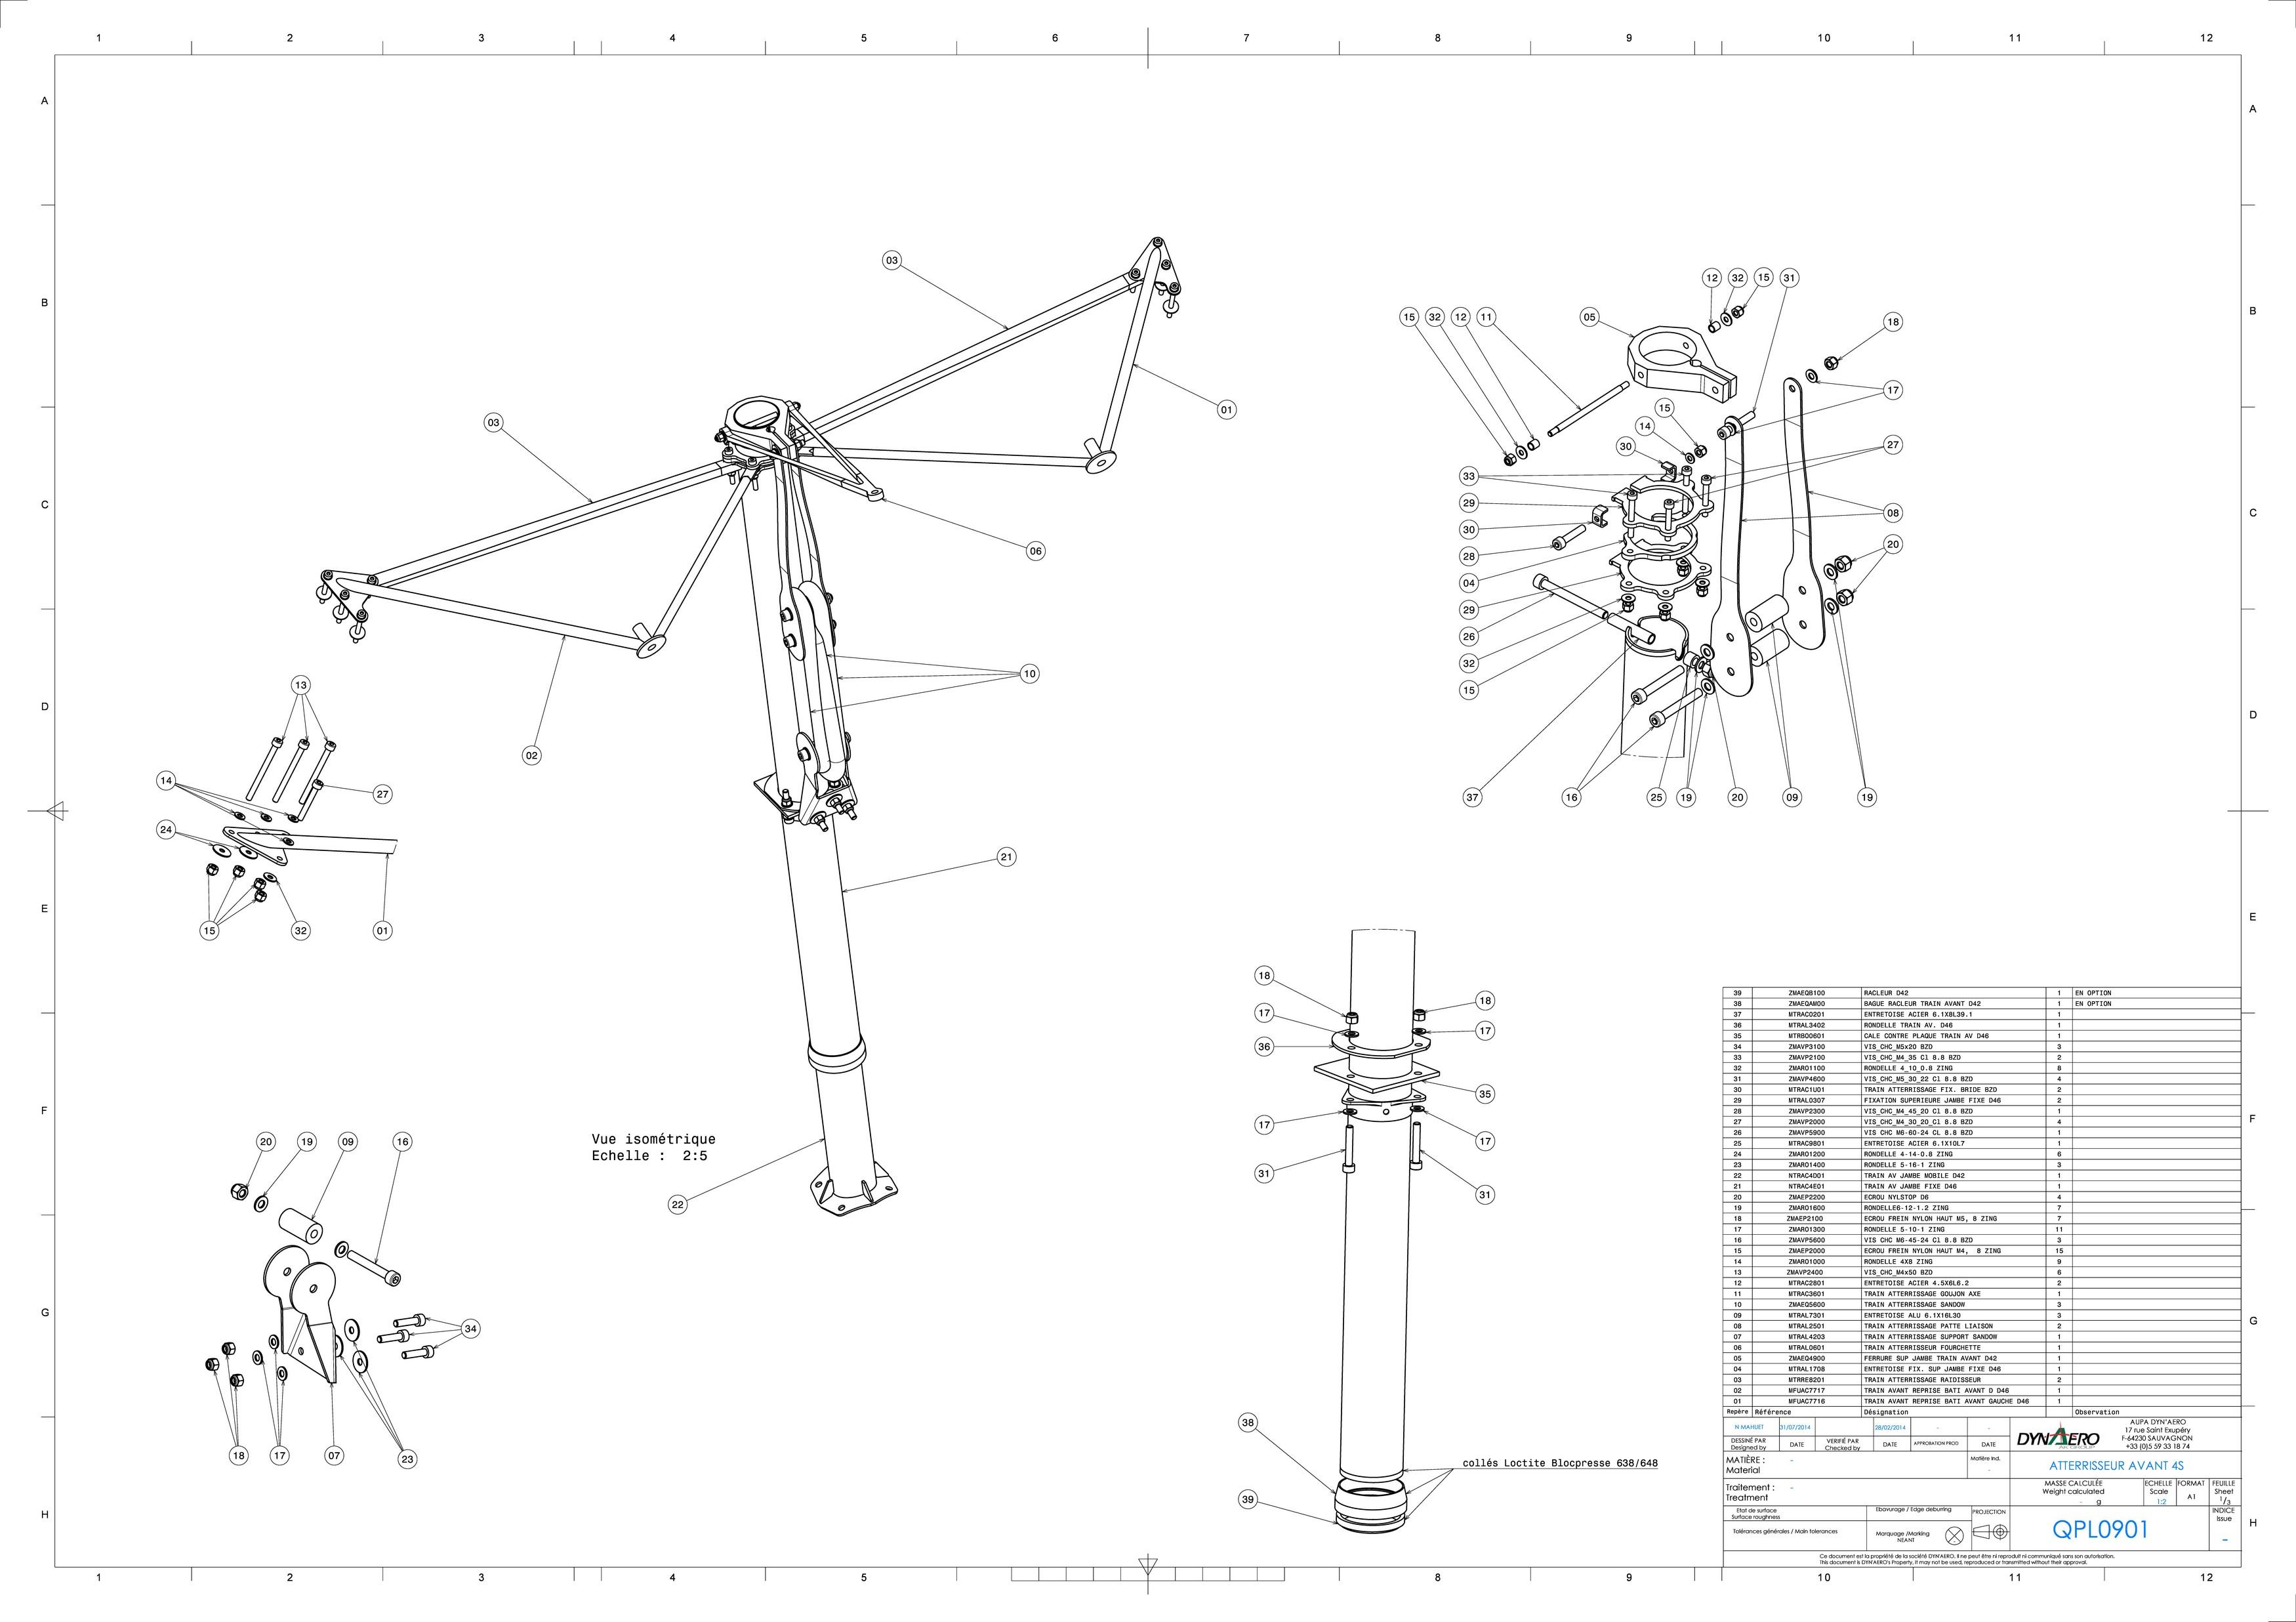 QPL0901 ATTERRISEUR AVANT MCR-4S QS